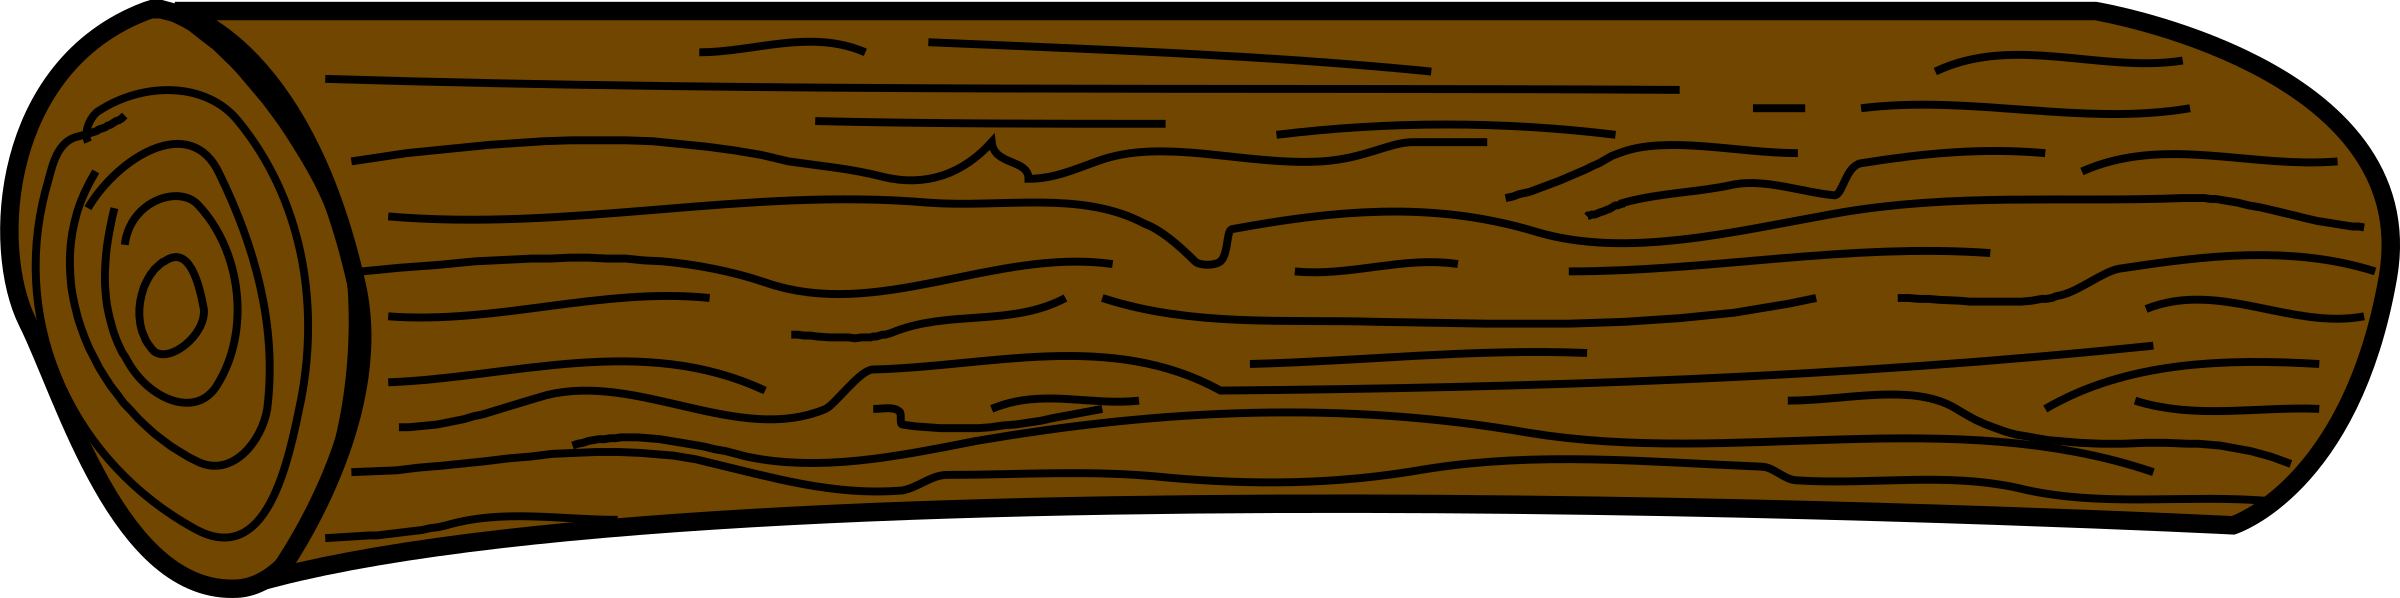 Log clipart. Big image png